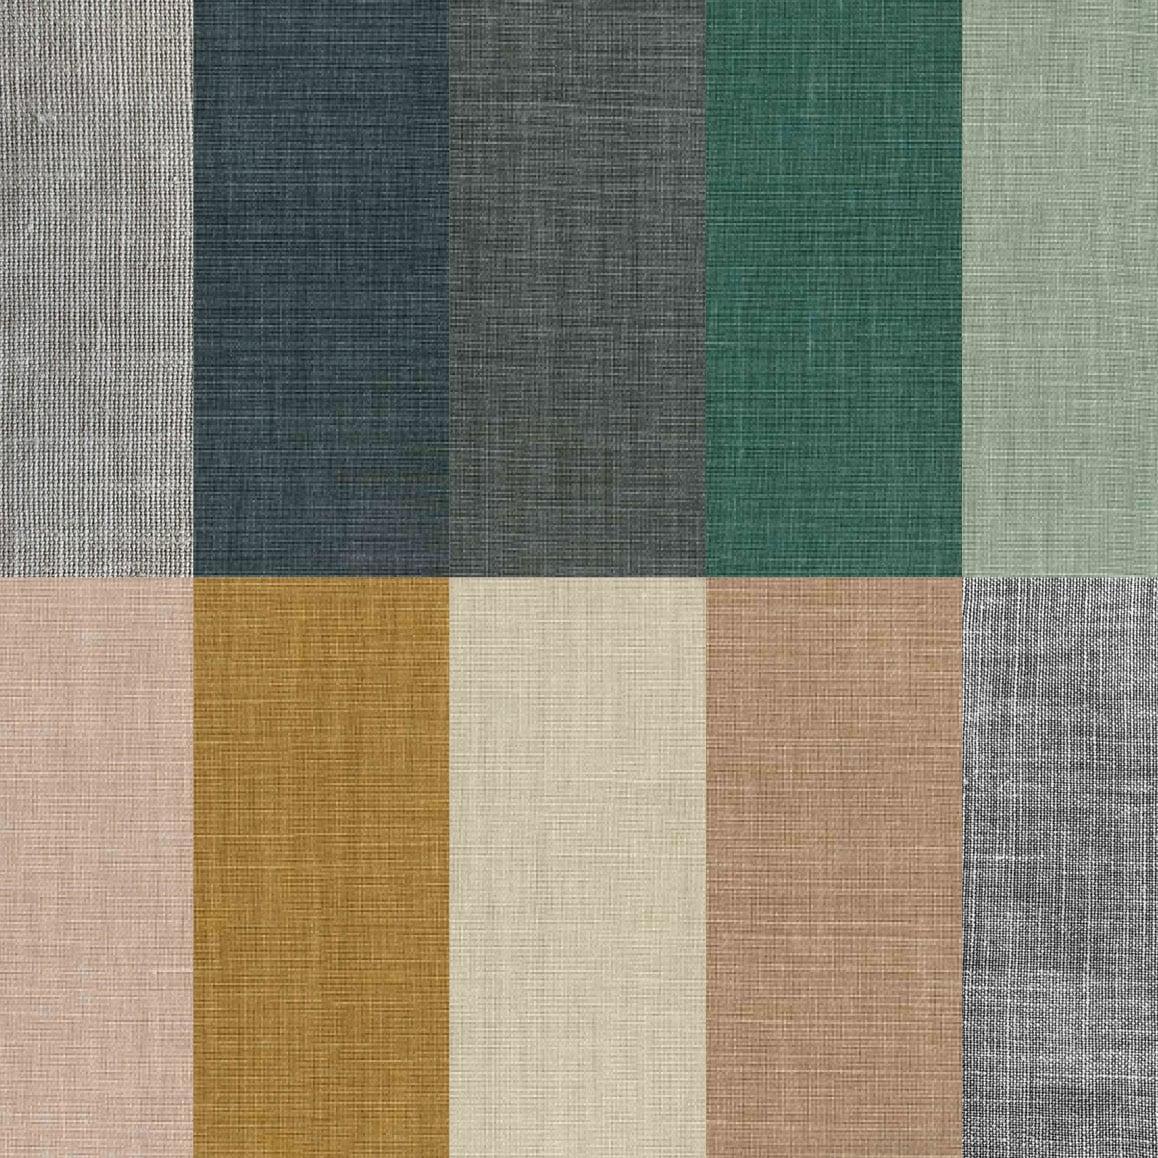 Order Dargo linen fabric sample